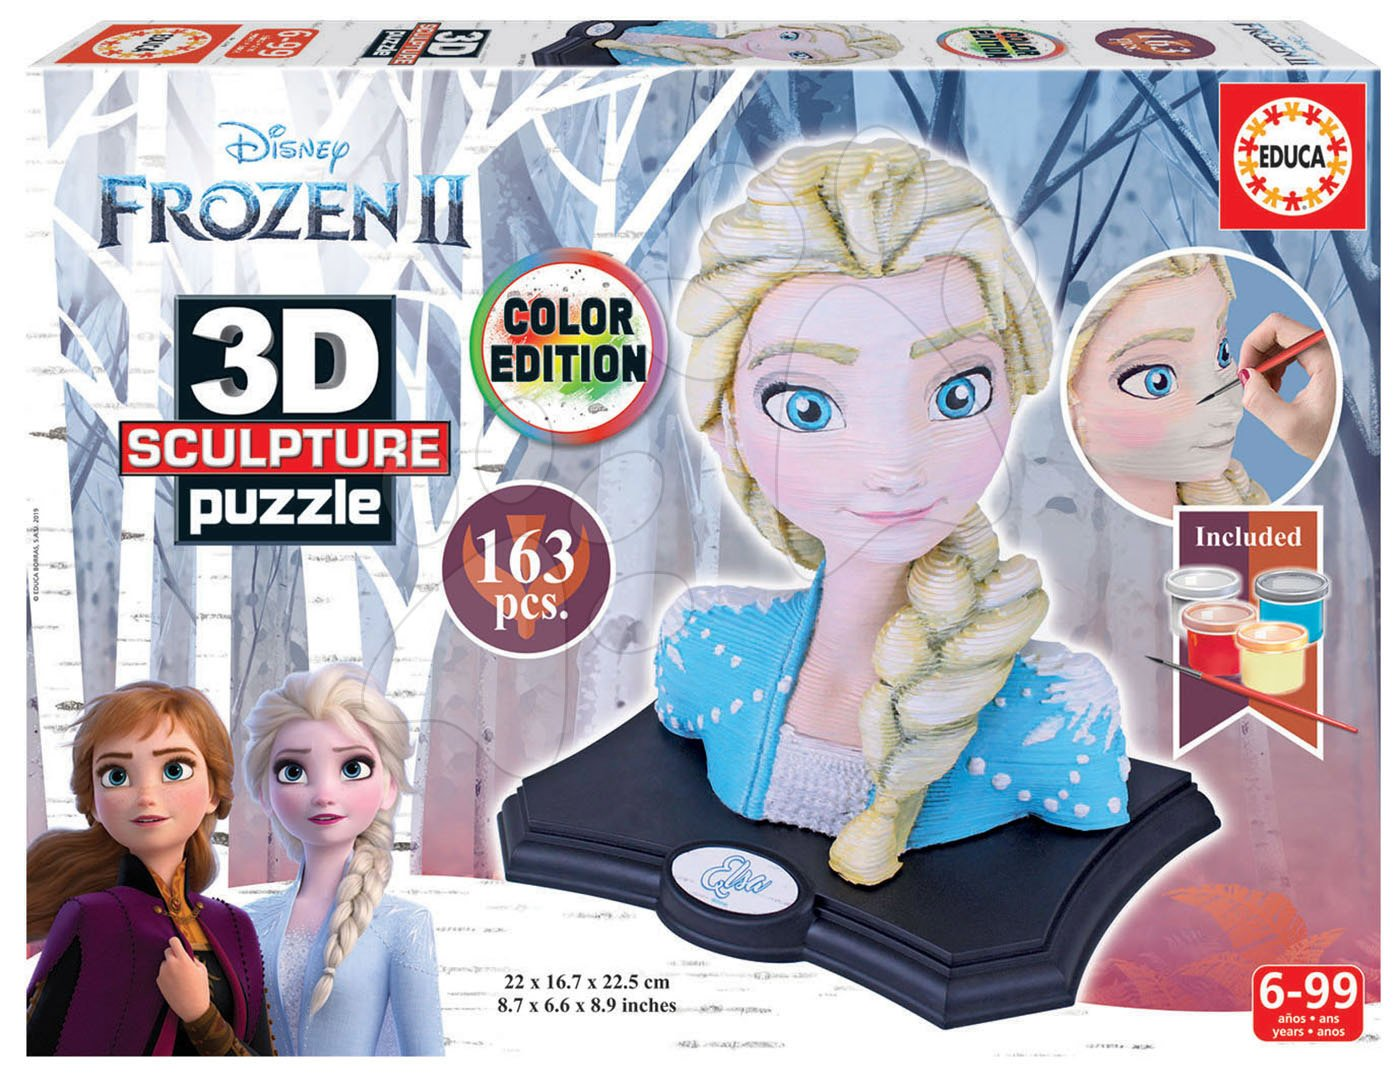 Sochárske puzzle 3D Sculpture - Frozen 2 Disney Color edition 163 dielov od 6 rokov